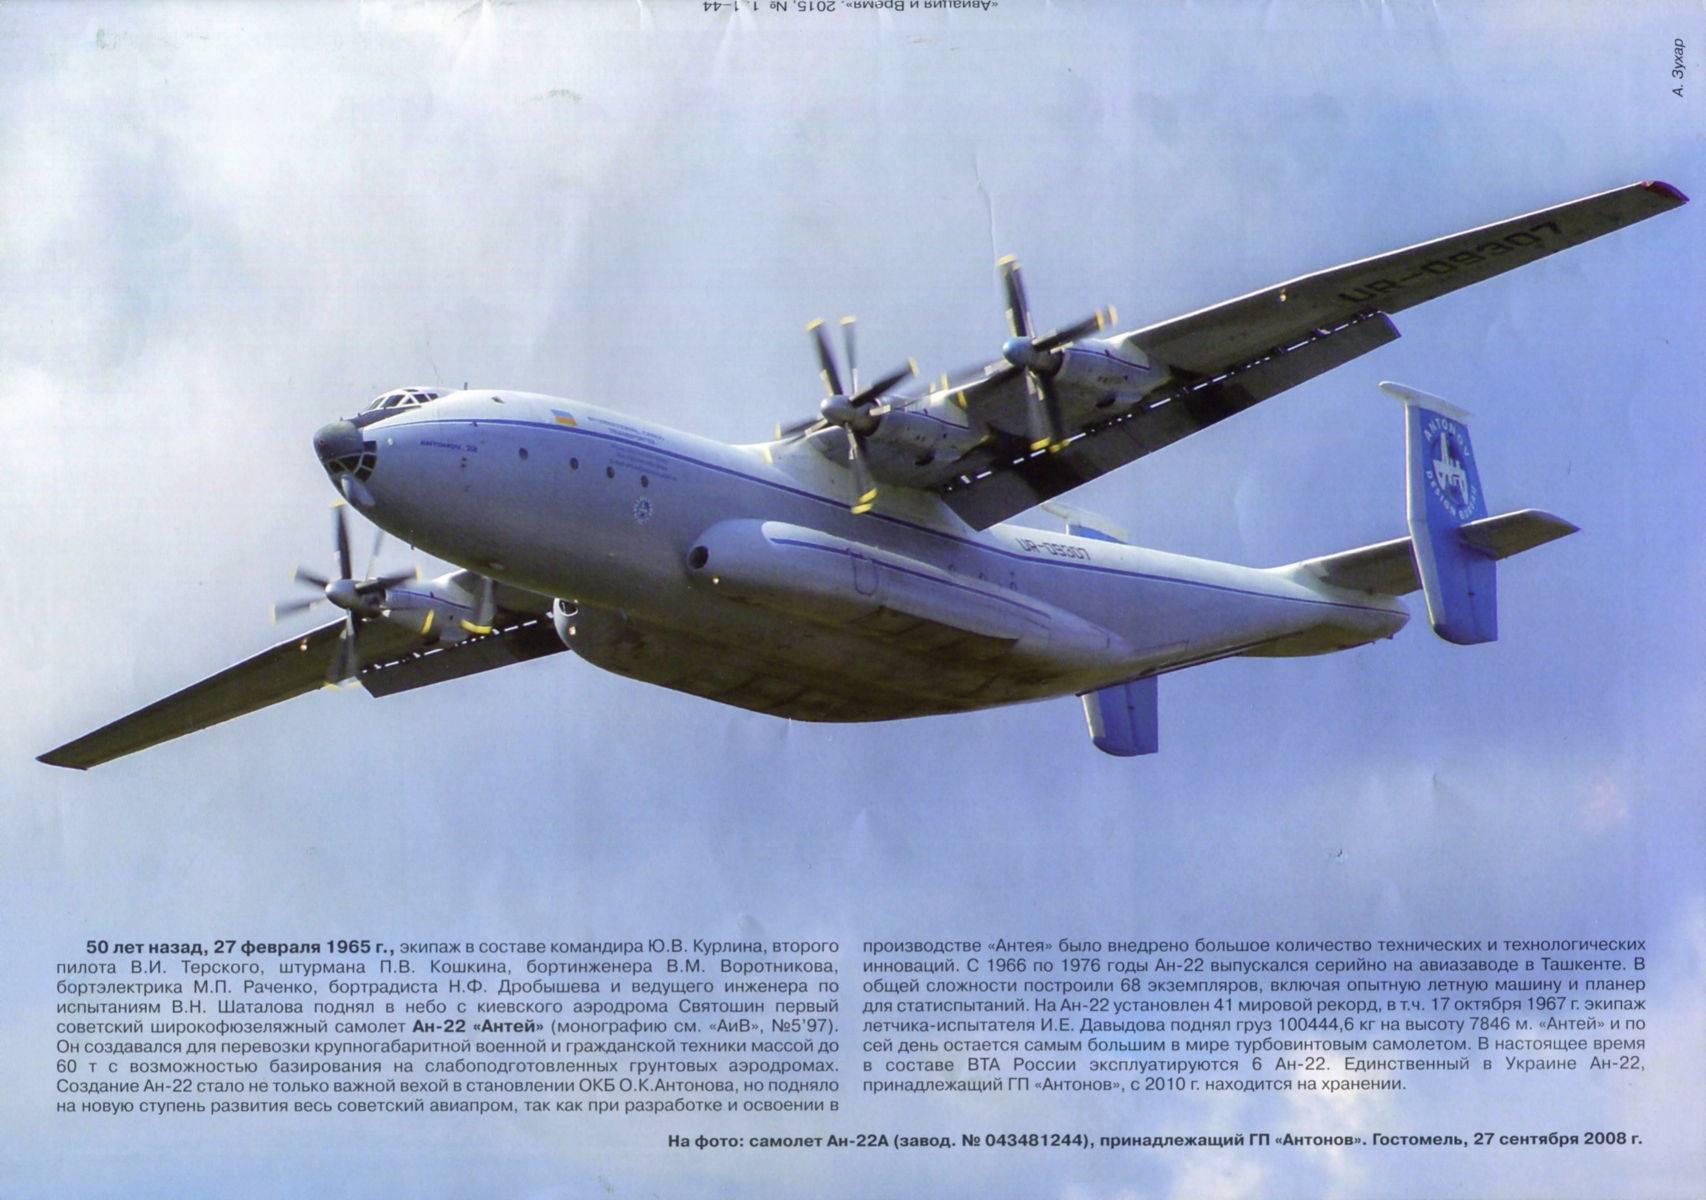 Антонов ан-71. фото, история и характеристики самолета.